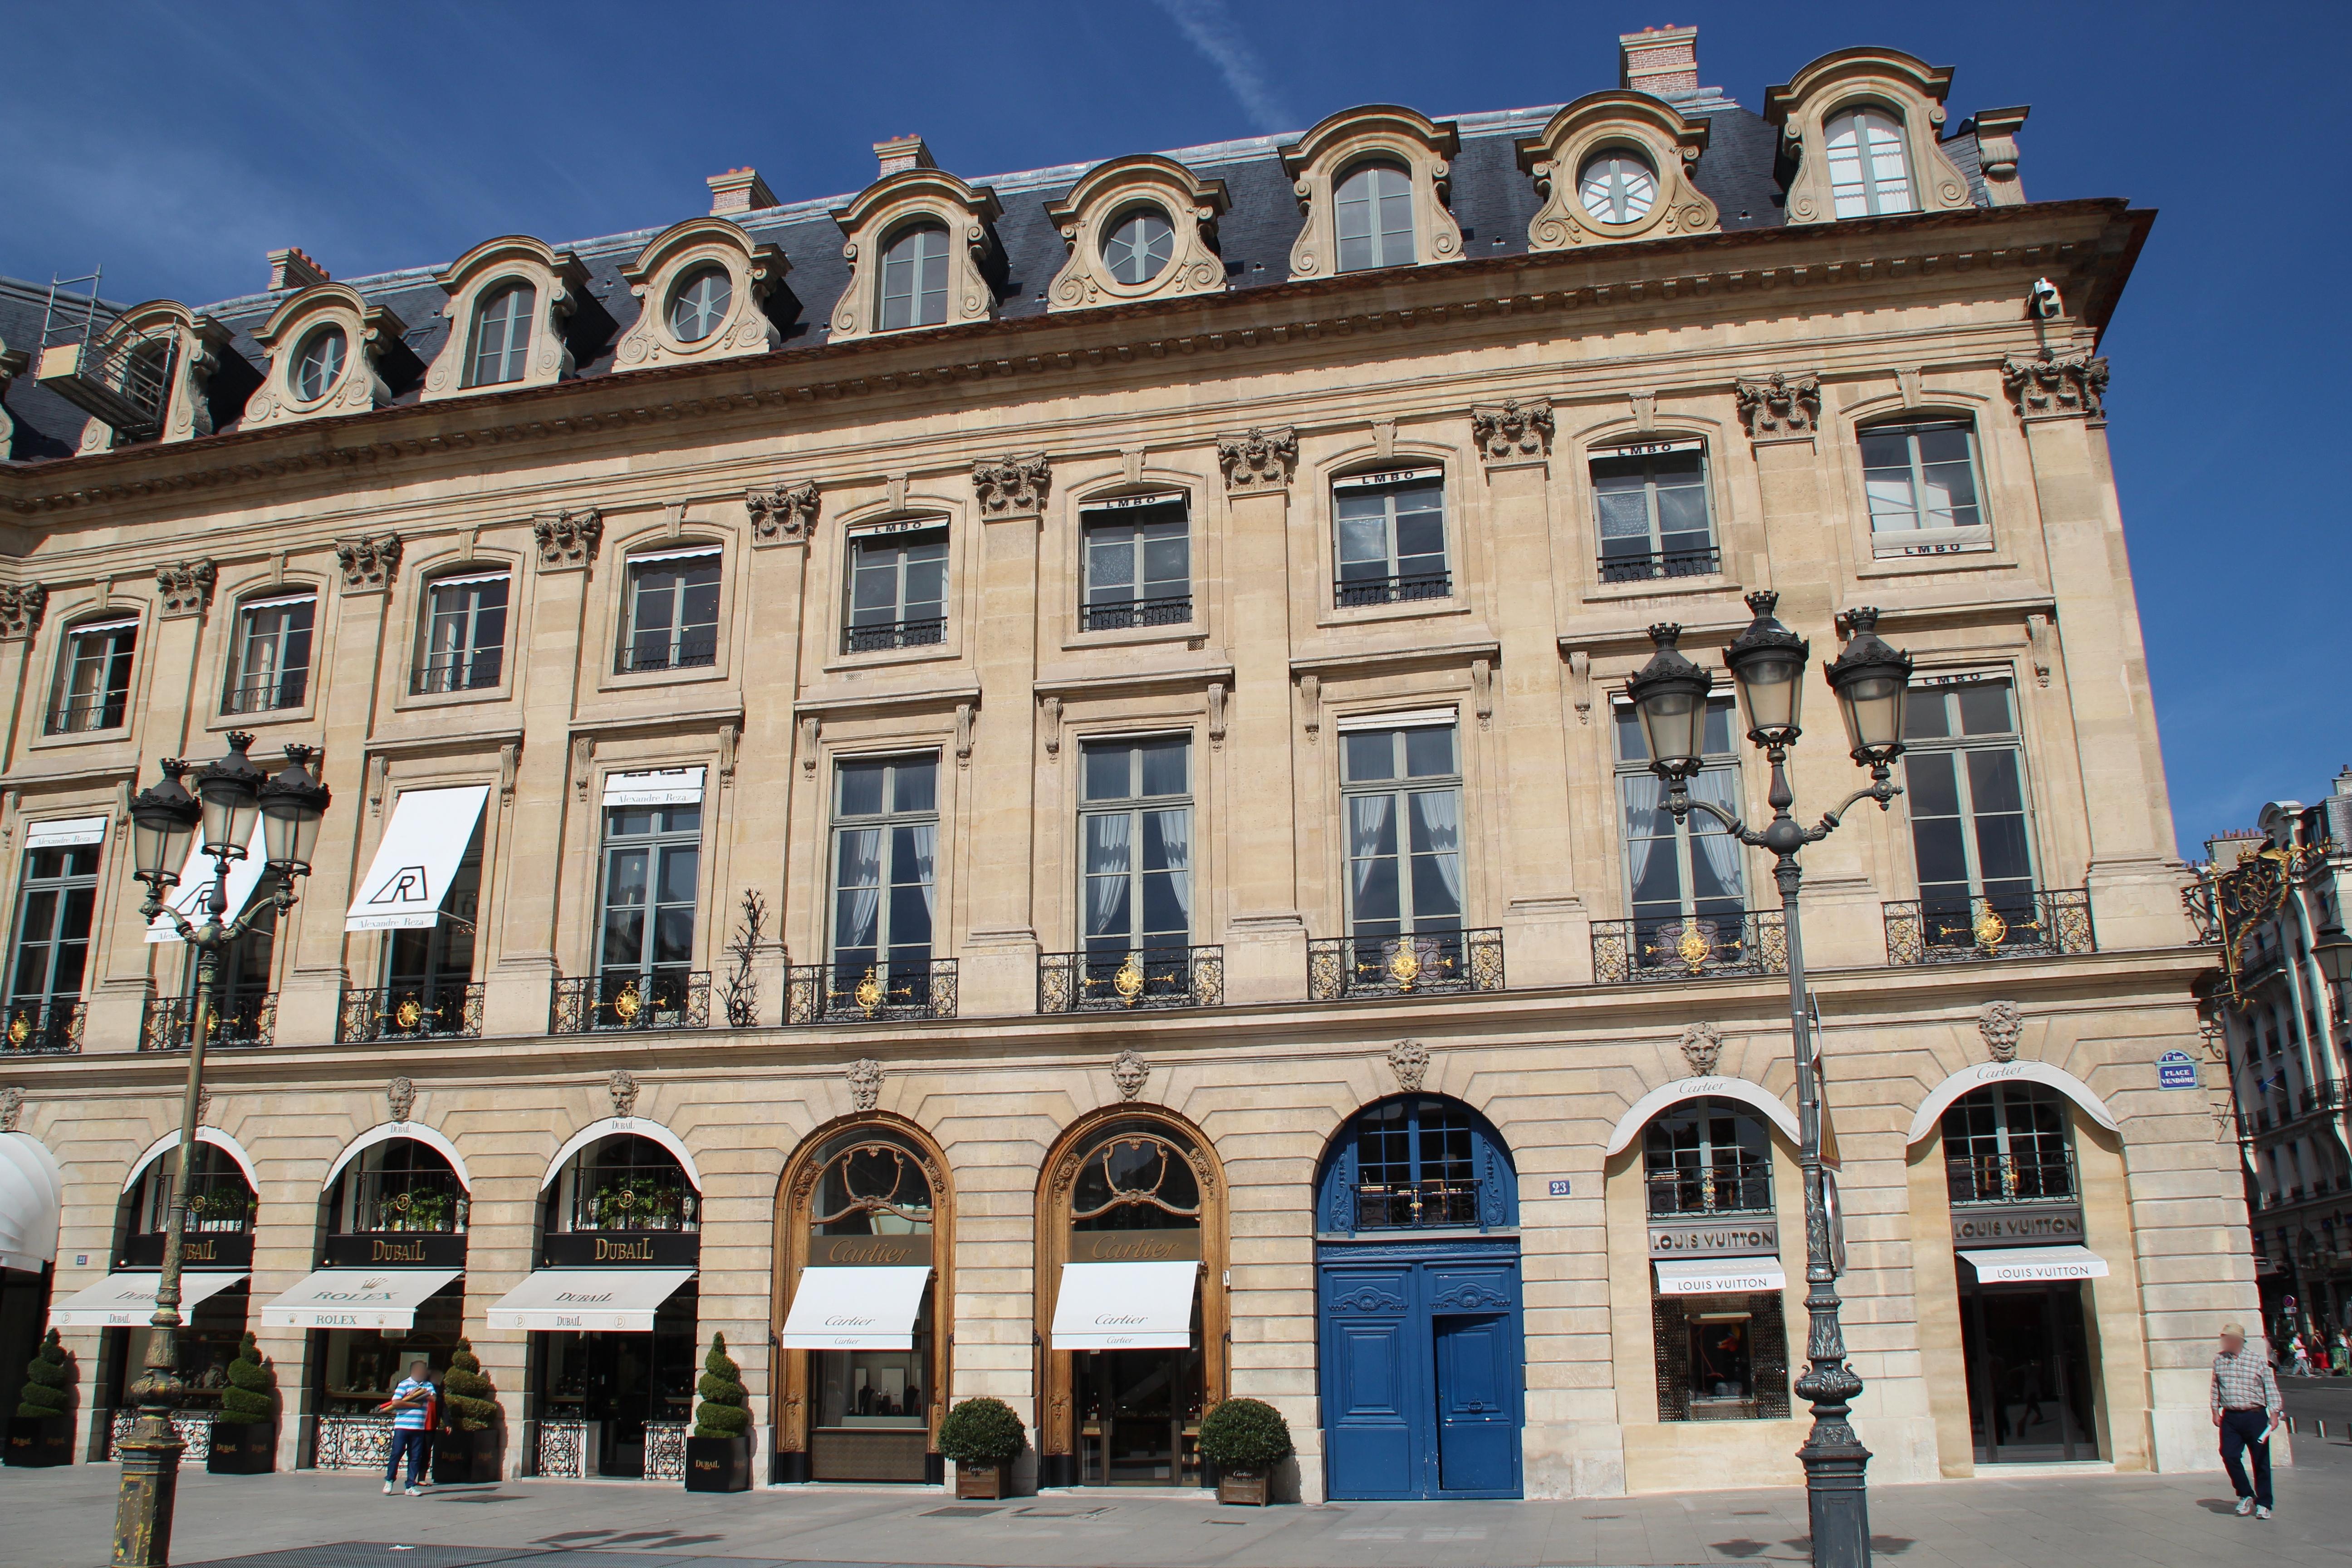 Hotel De Vendome Paris